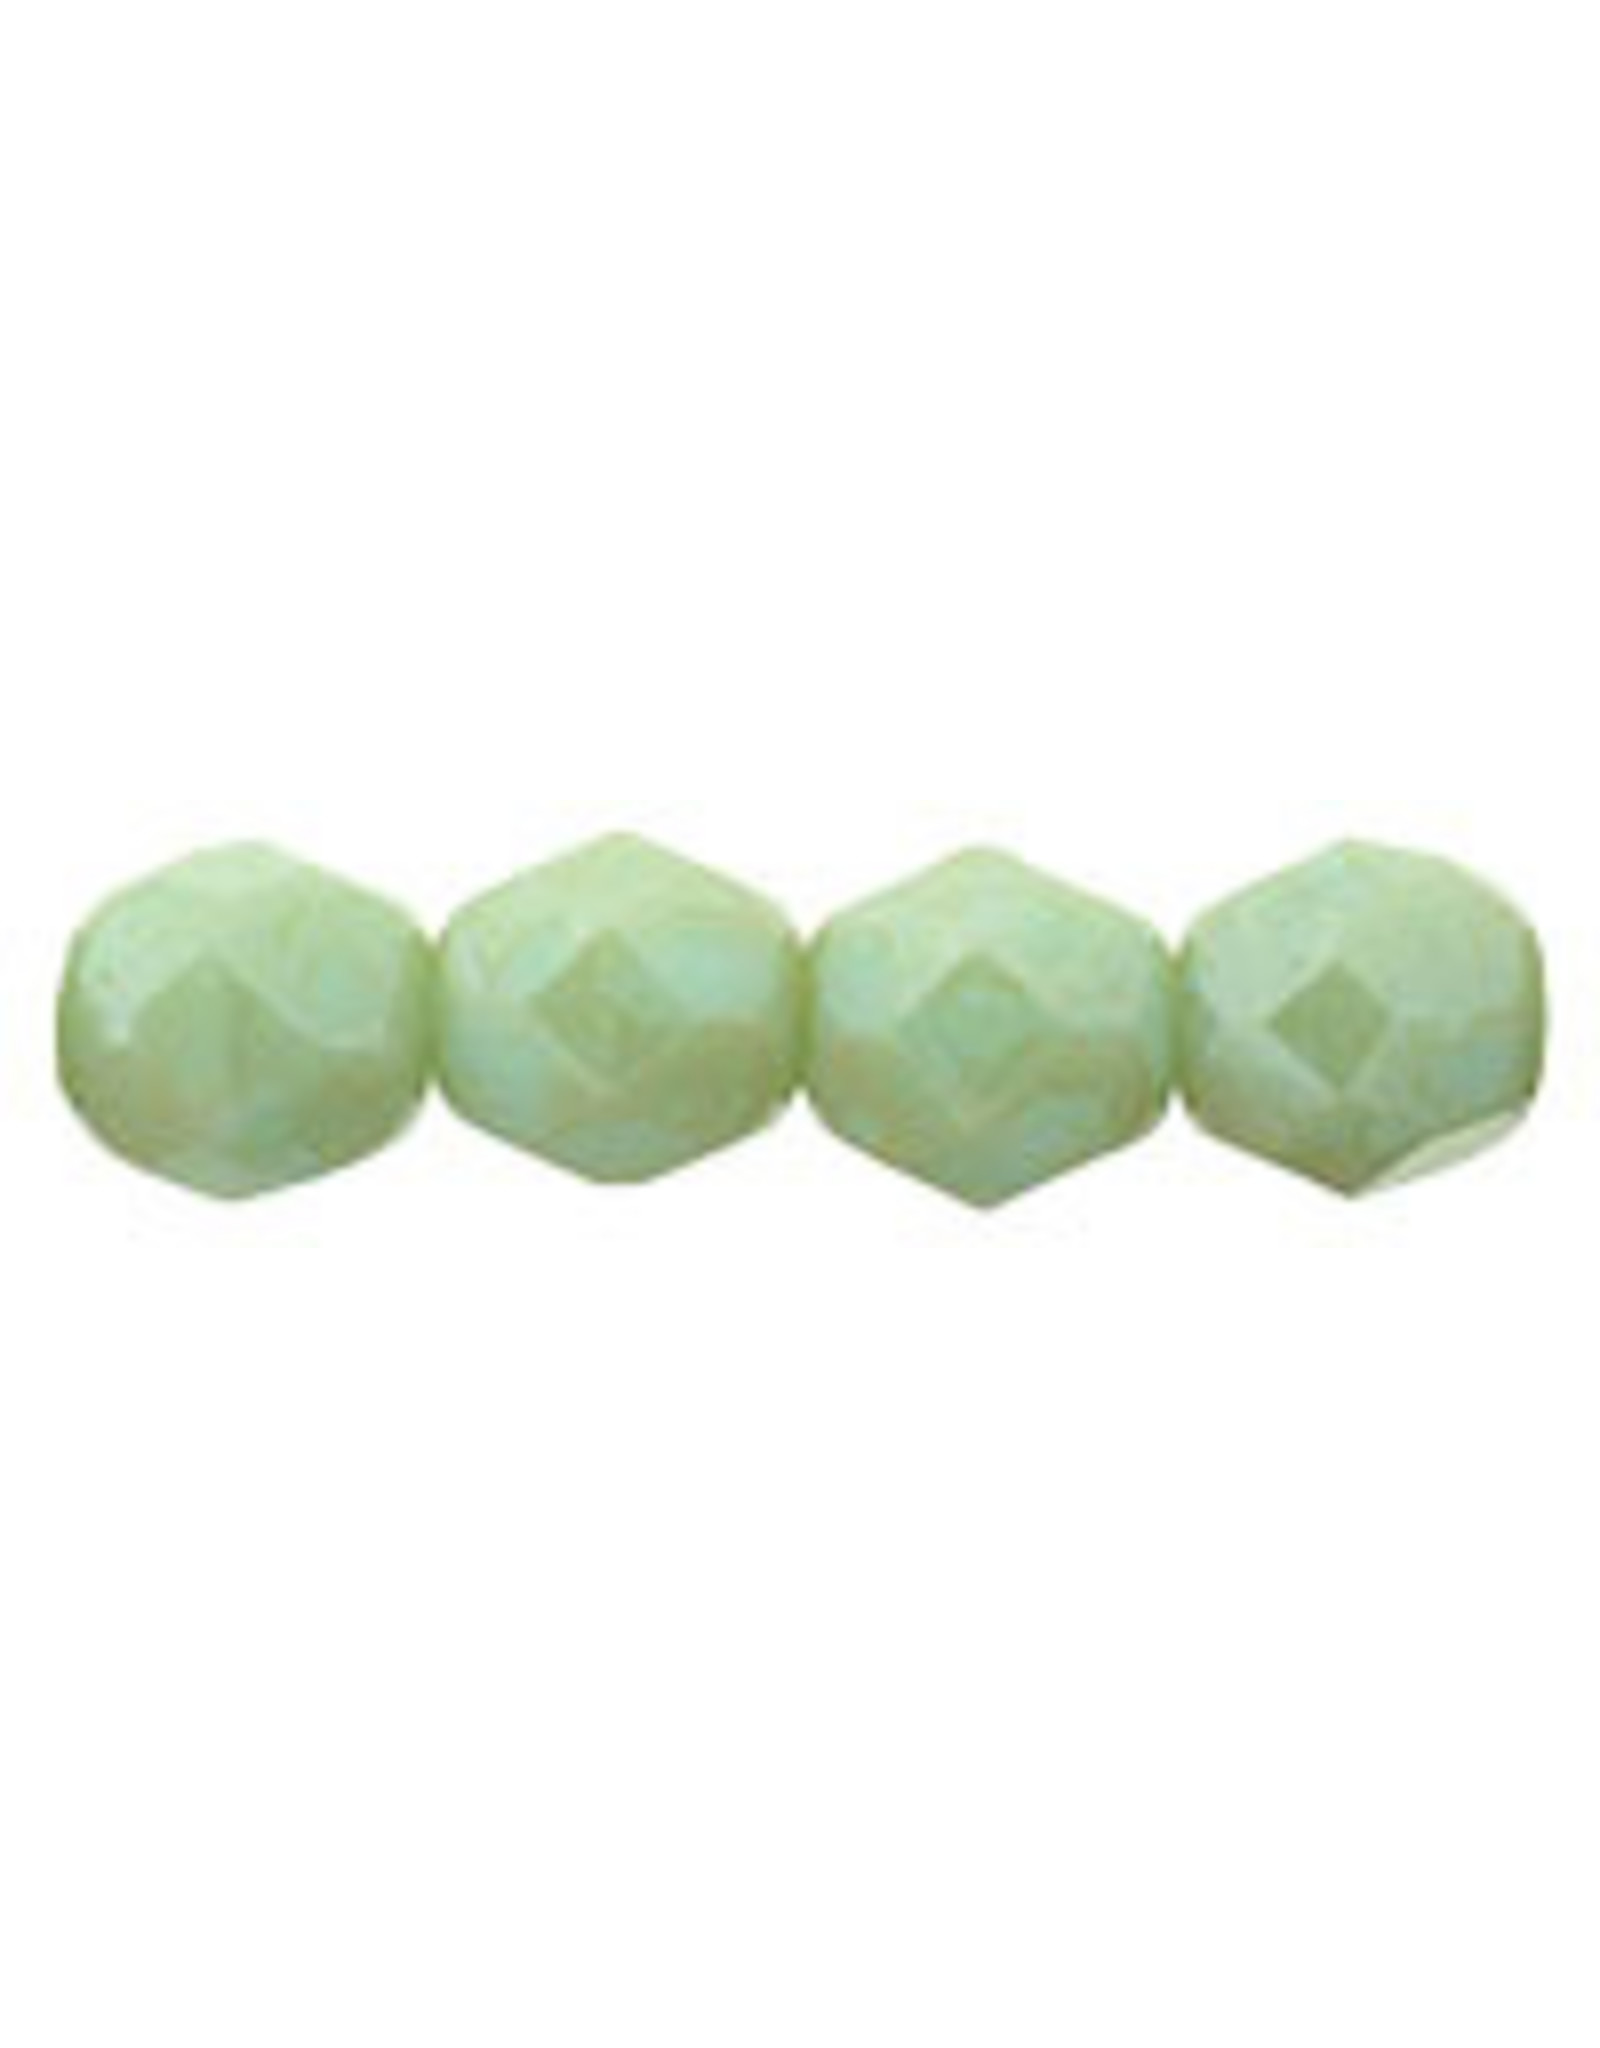 Czech 6mm Fire Polish Pale Turquoise  Green Stardust x25